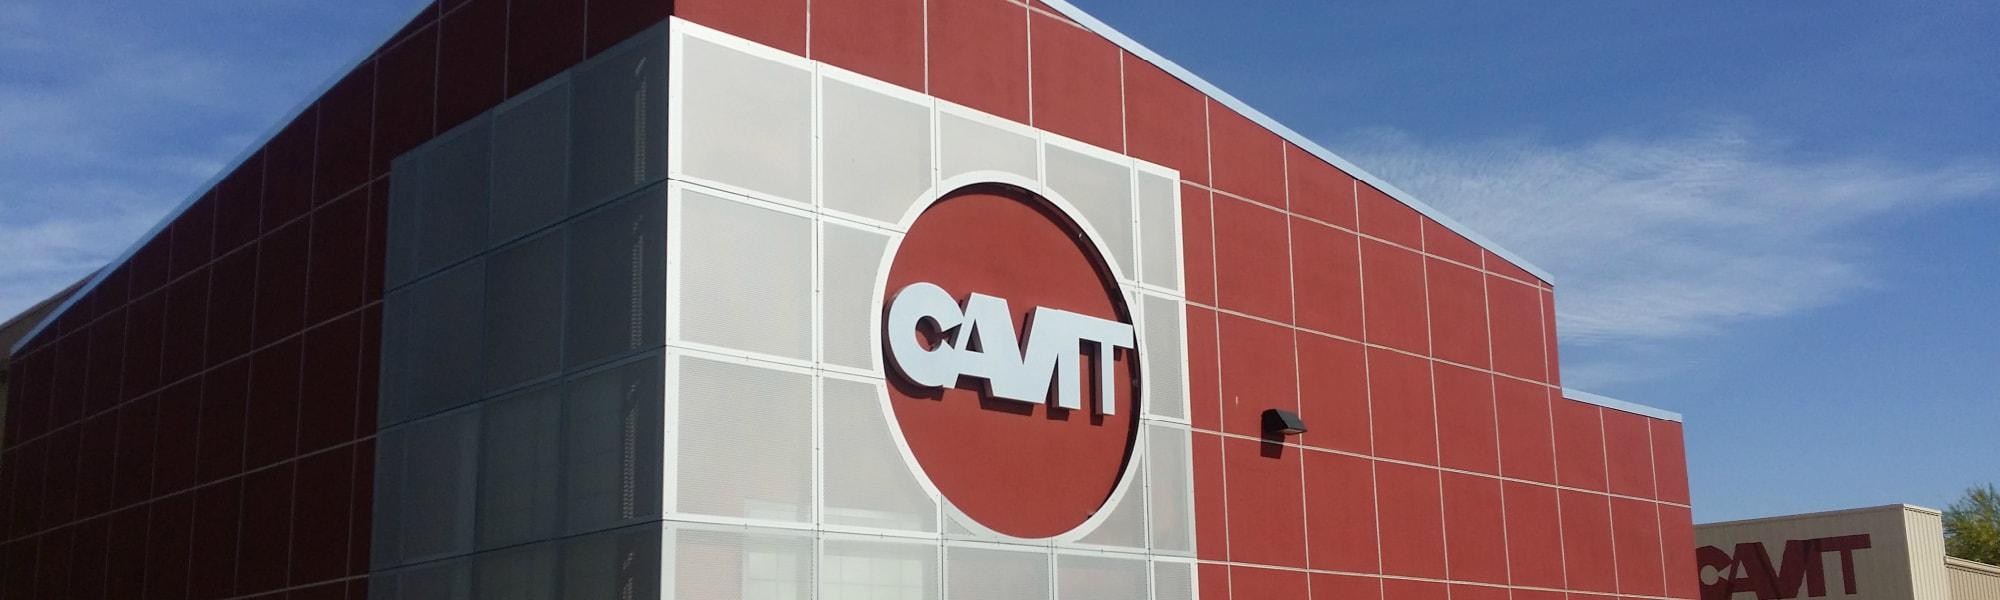 CAVIT Building